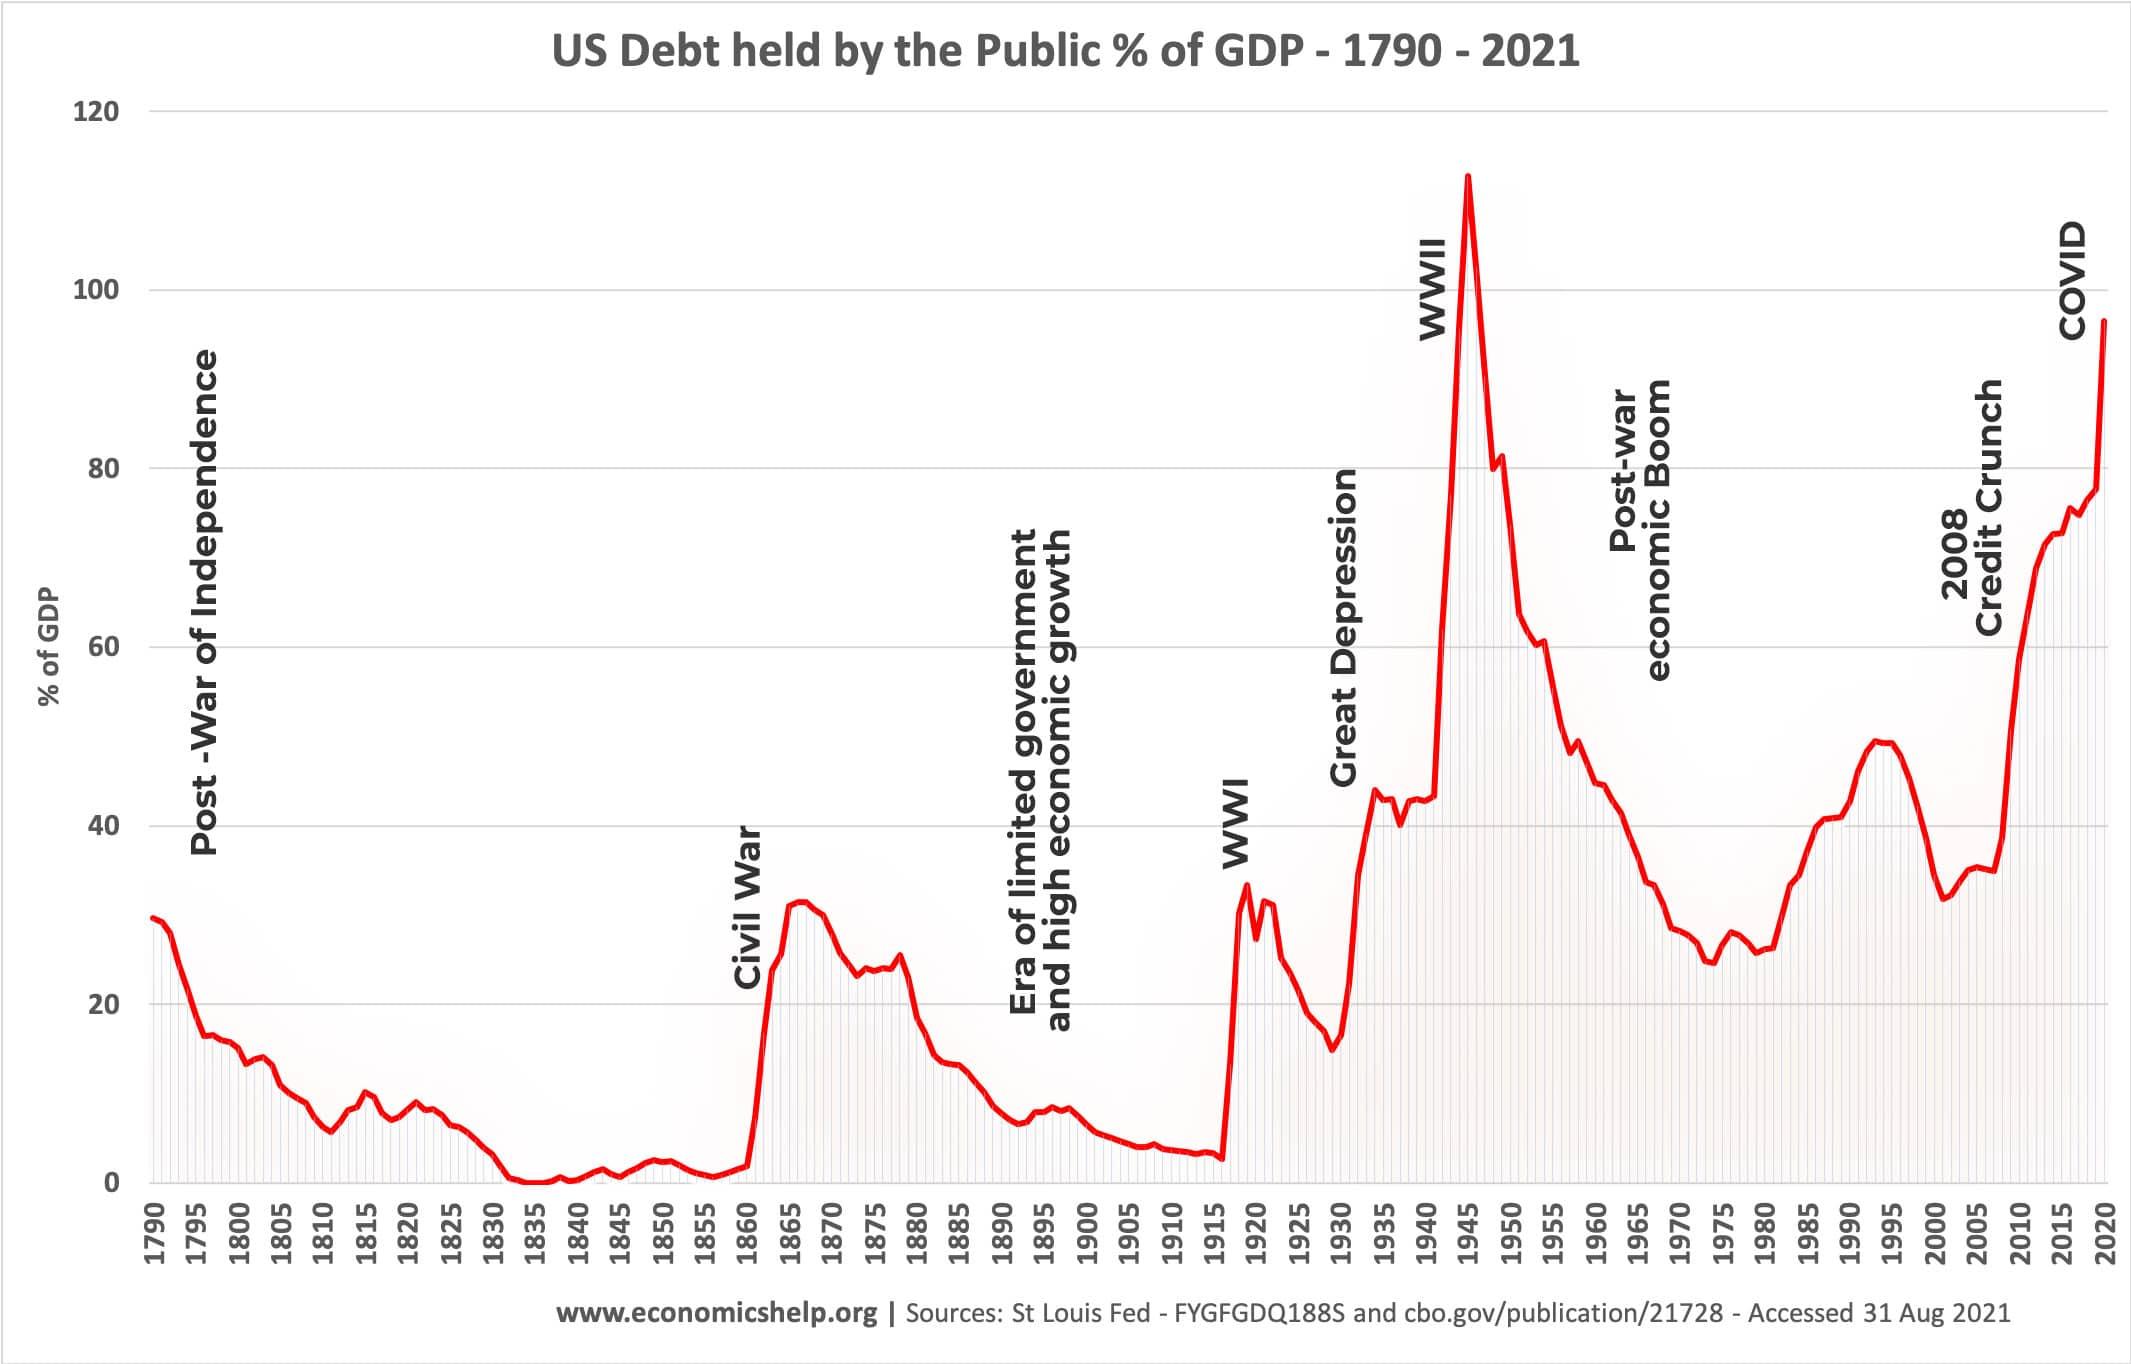 us-national-debt-held-public-1790-2021